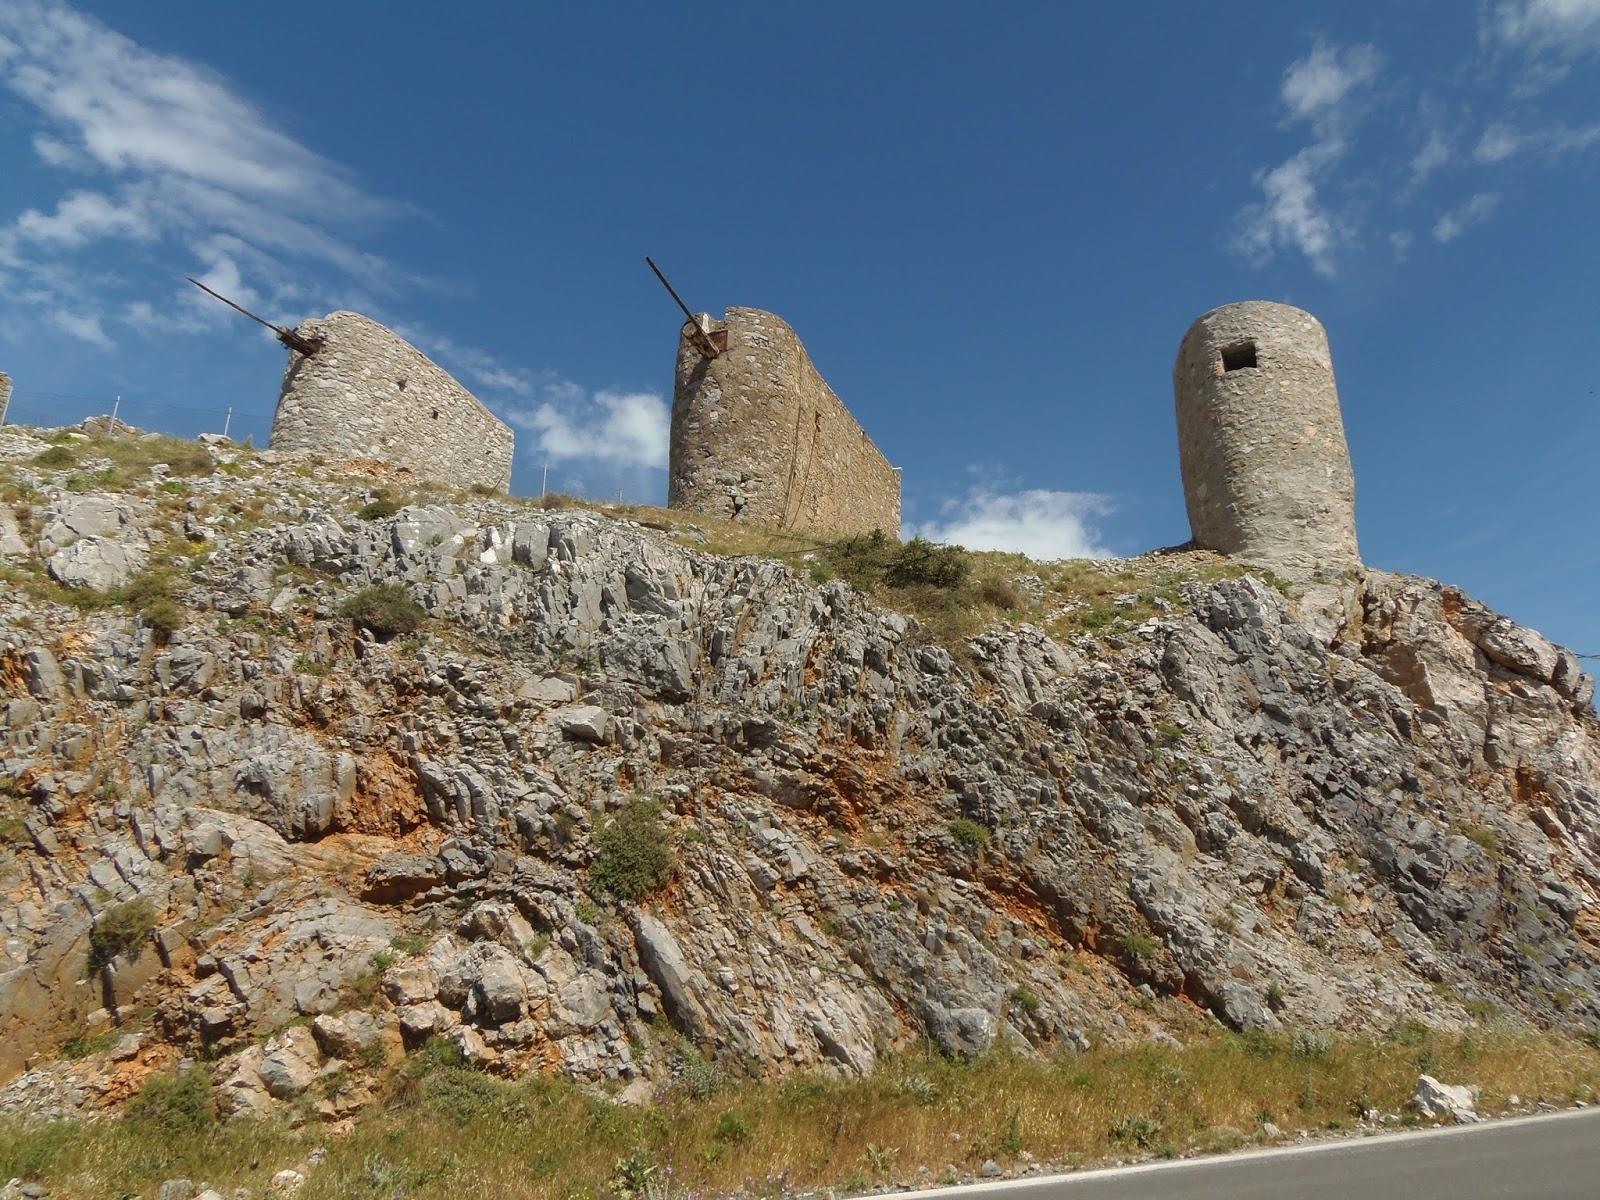 windmills, travel, crete, greece, greek, water, food, traditional, history, ancient history, traveling, adventure, jeep safari